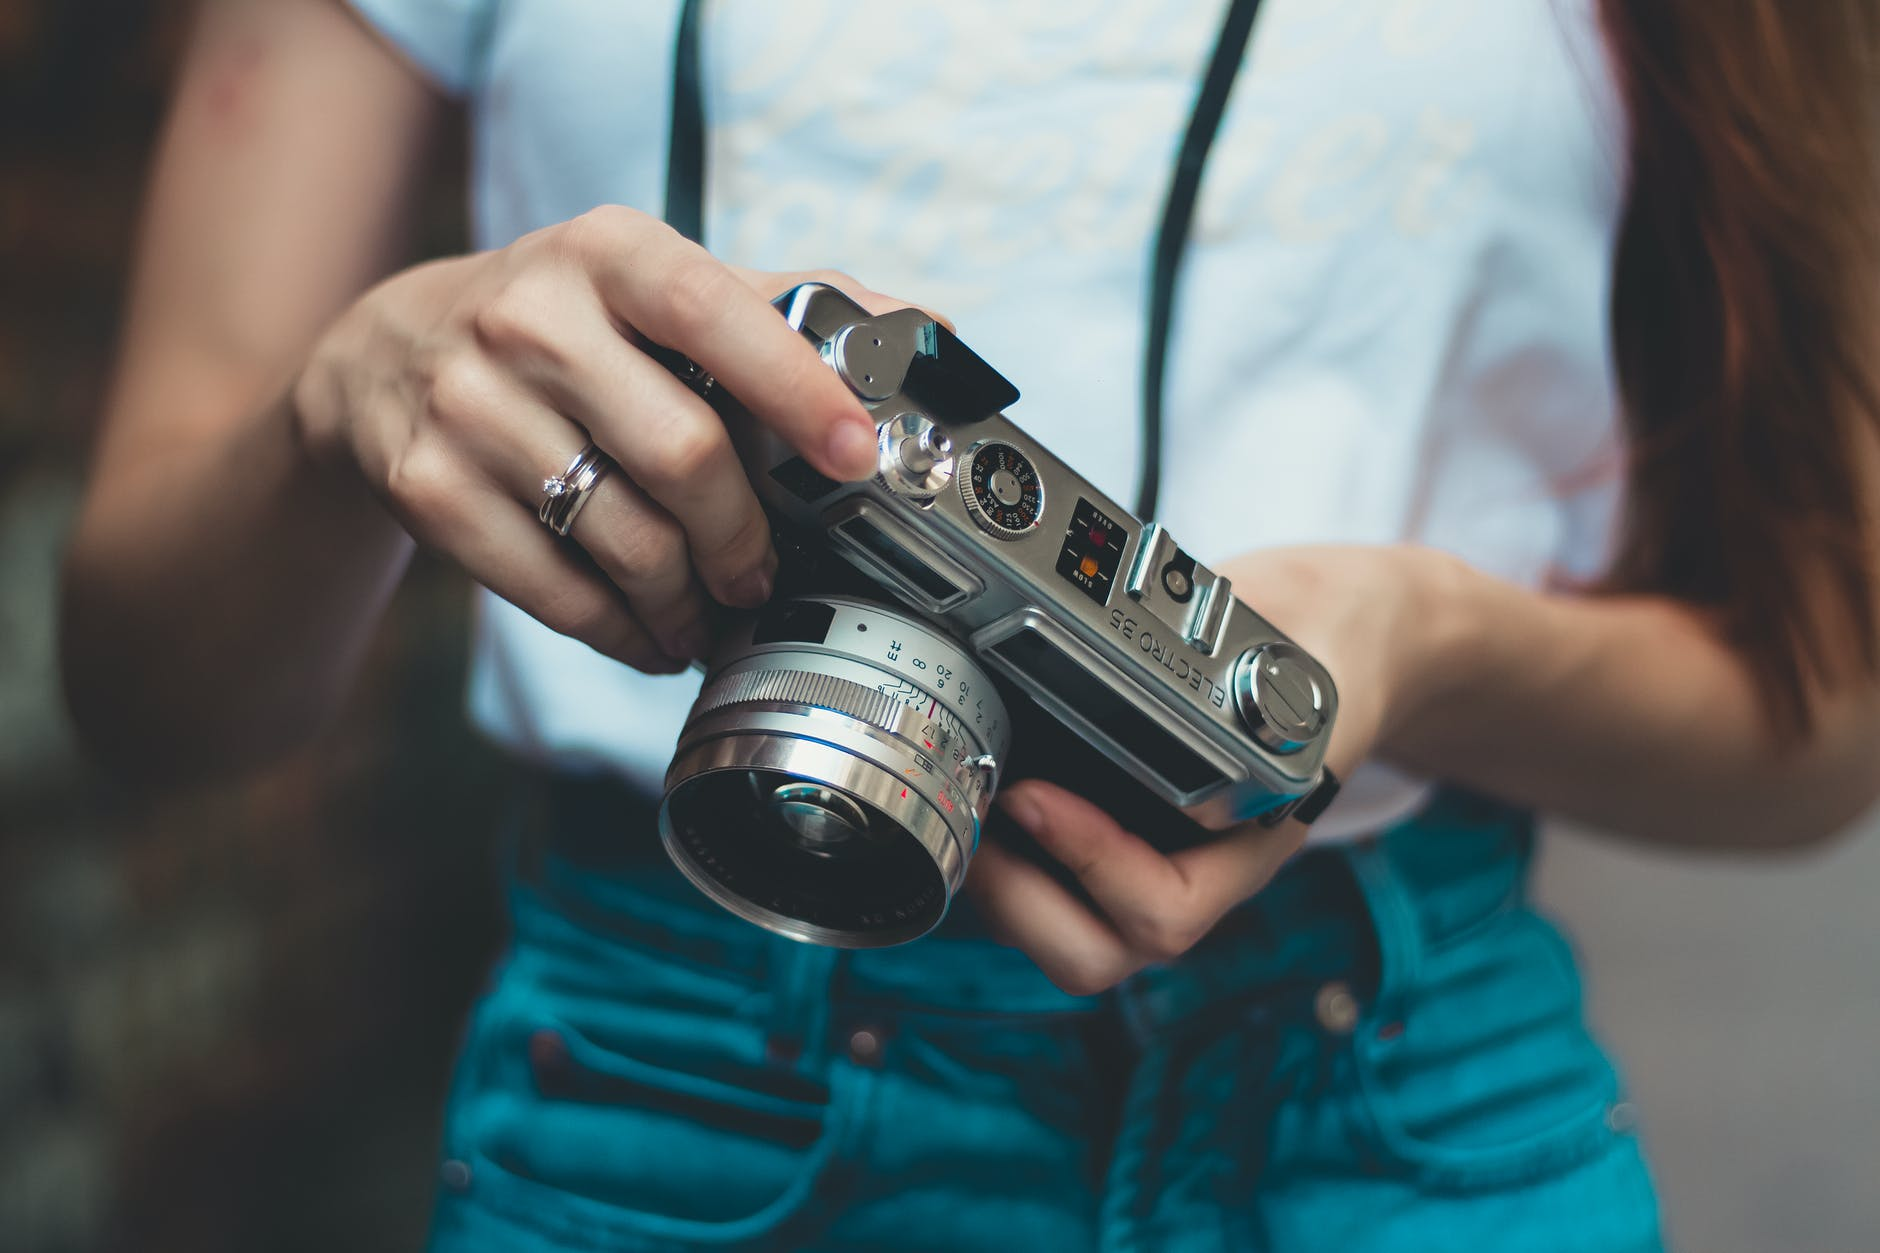 woman in white shirt holding analog camera